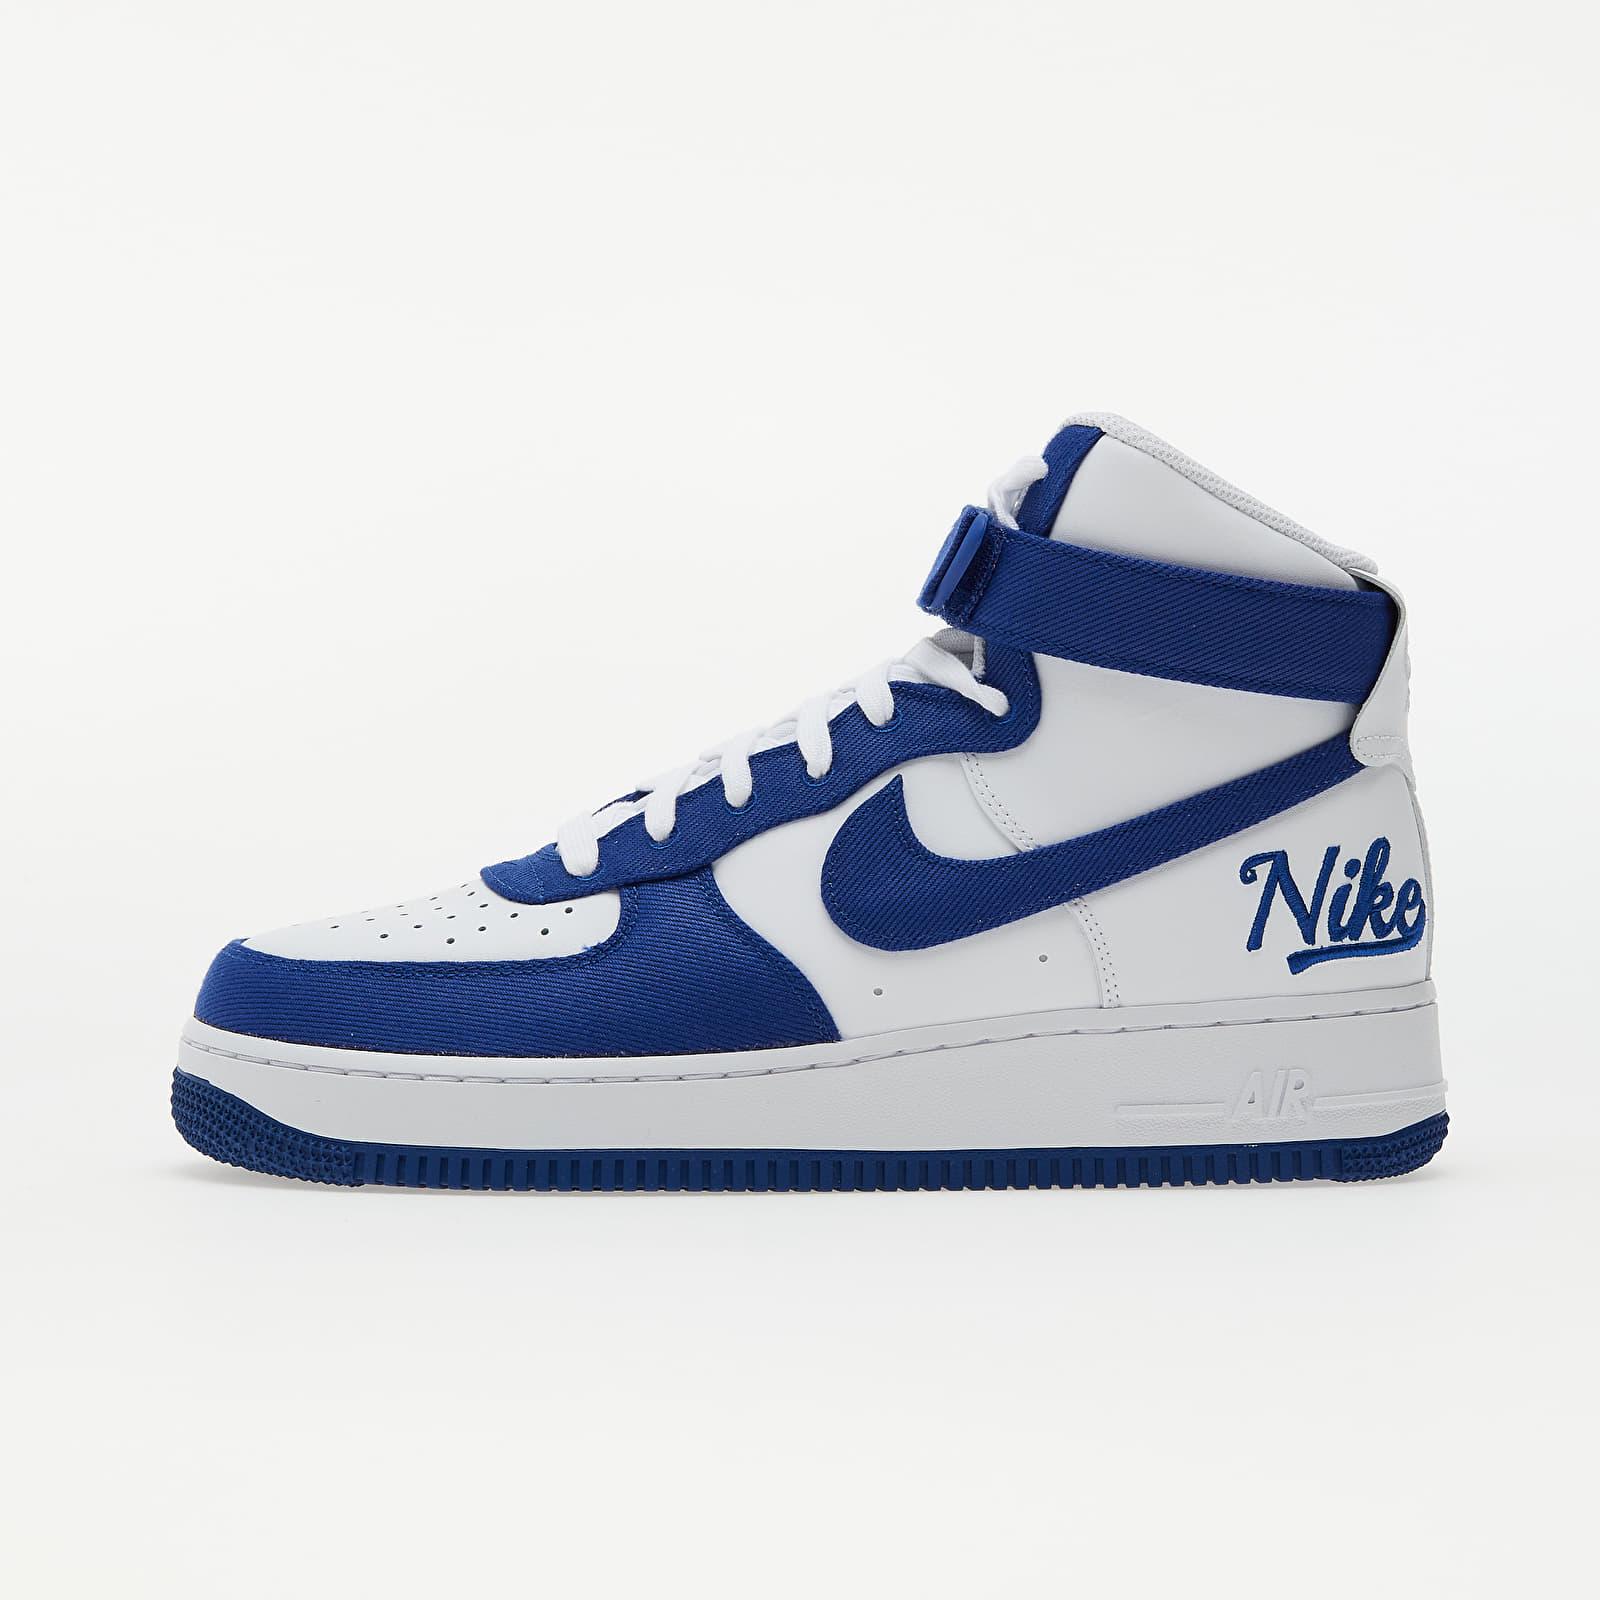 Nike Air Force 1 High '07 LV8 Emb White/ Rush Blue-Rush Blue-White EUR 44